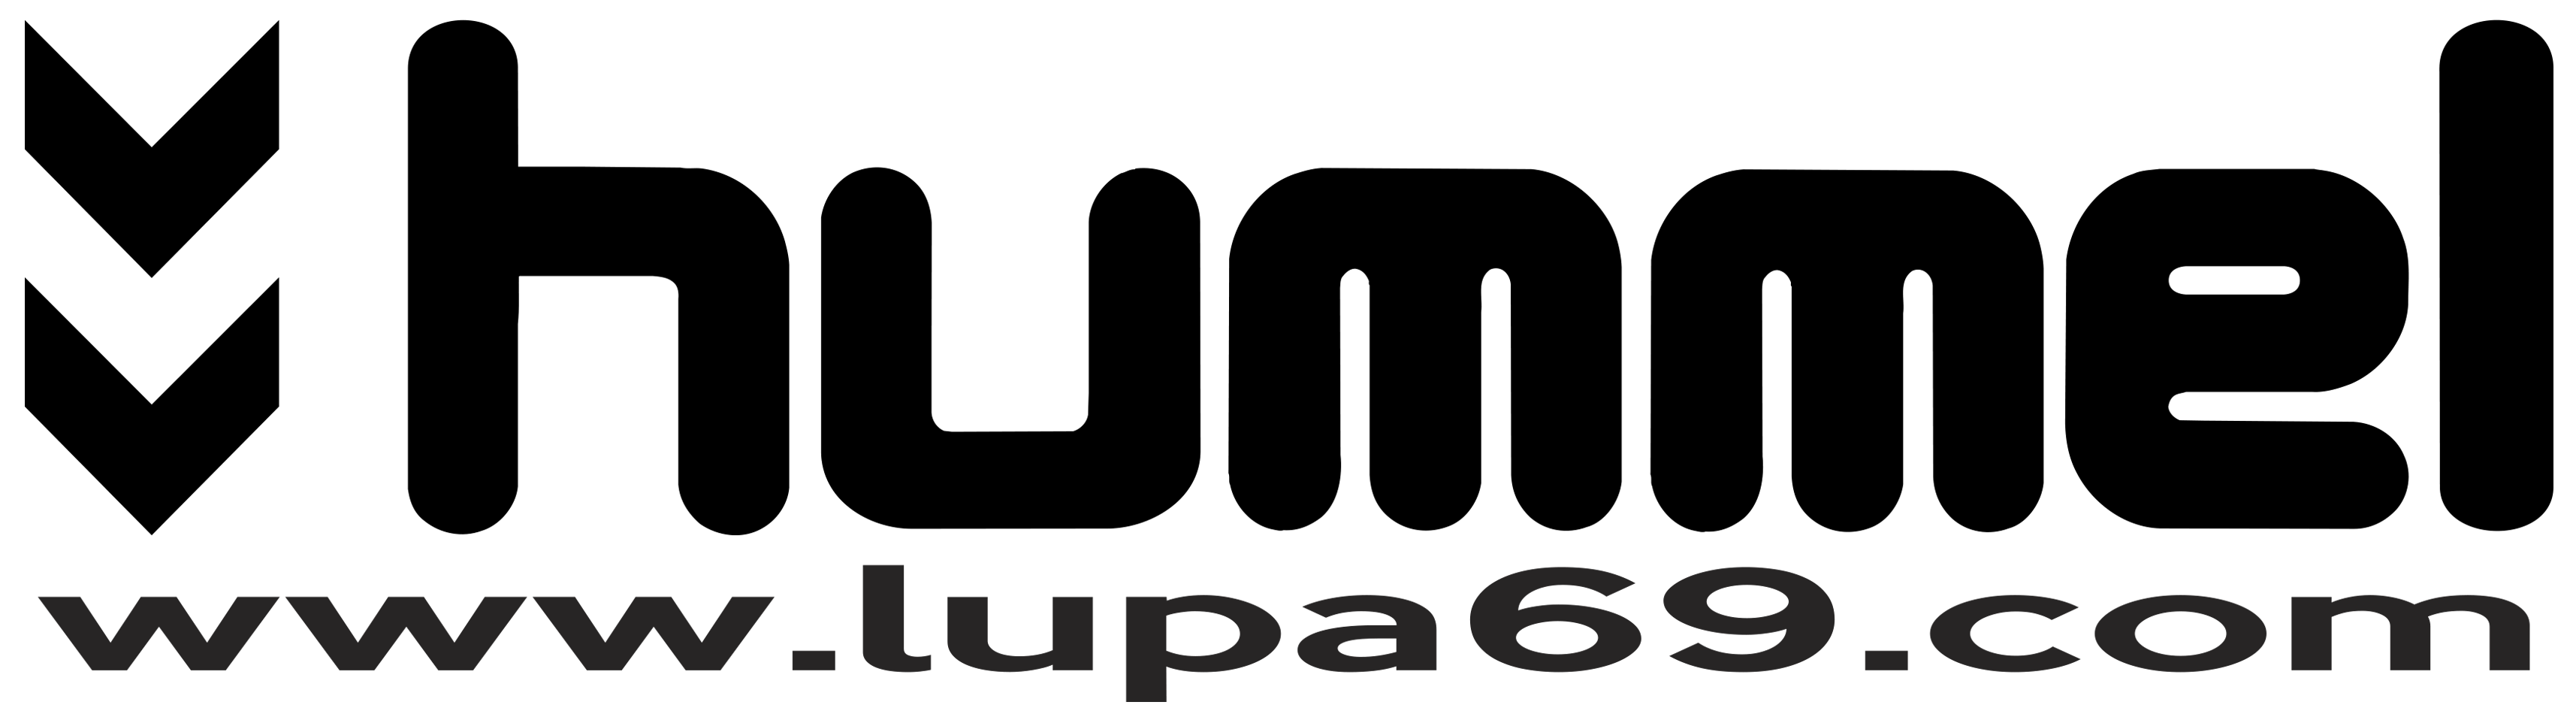 http://www.lupa69.com